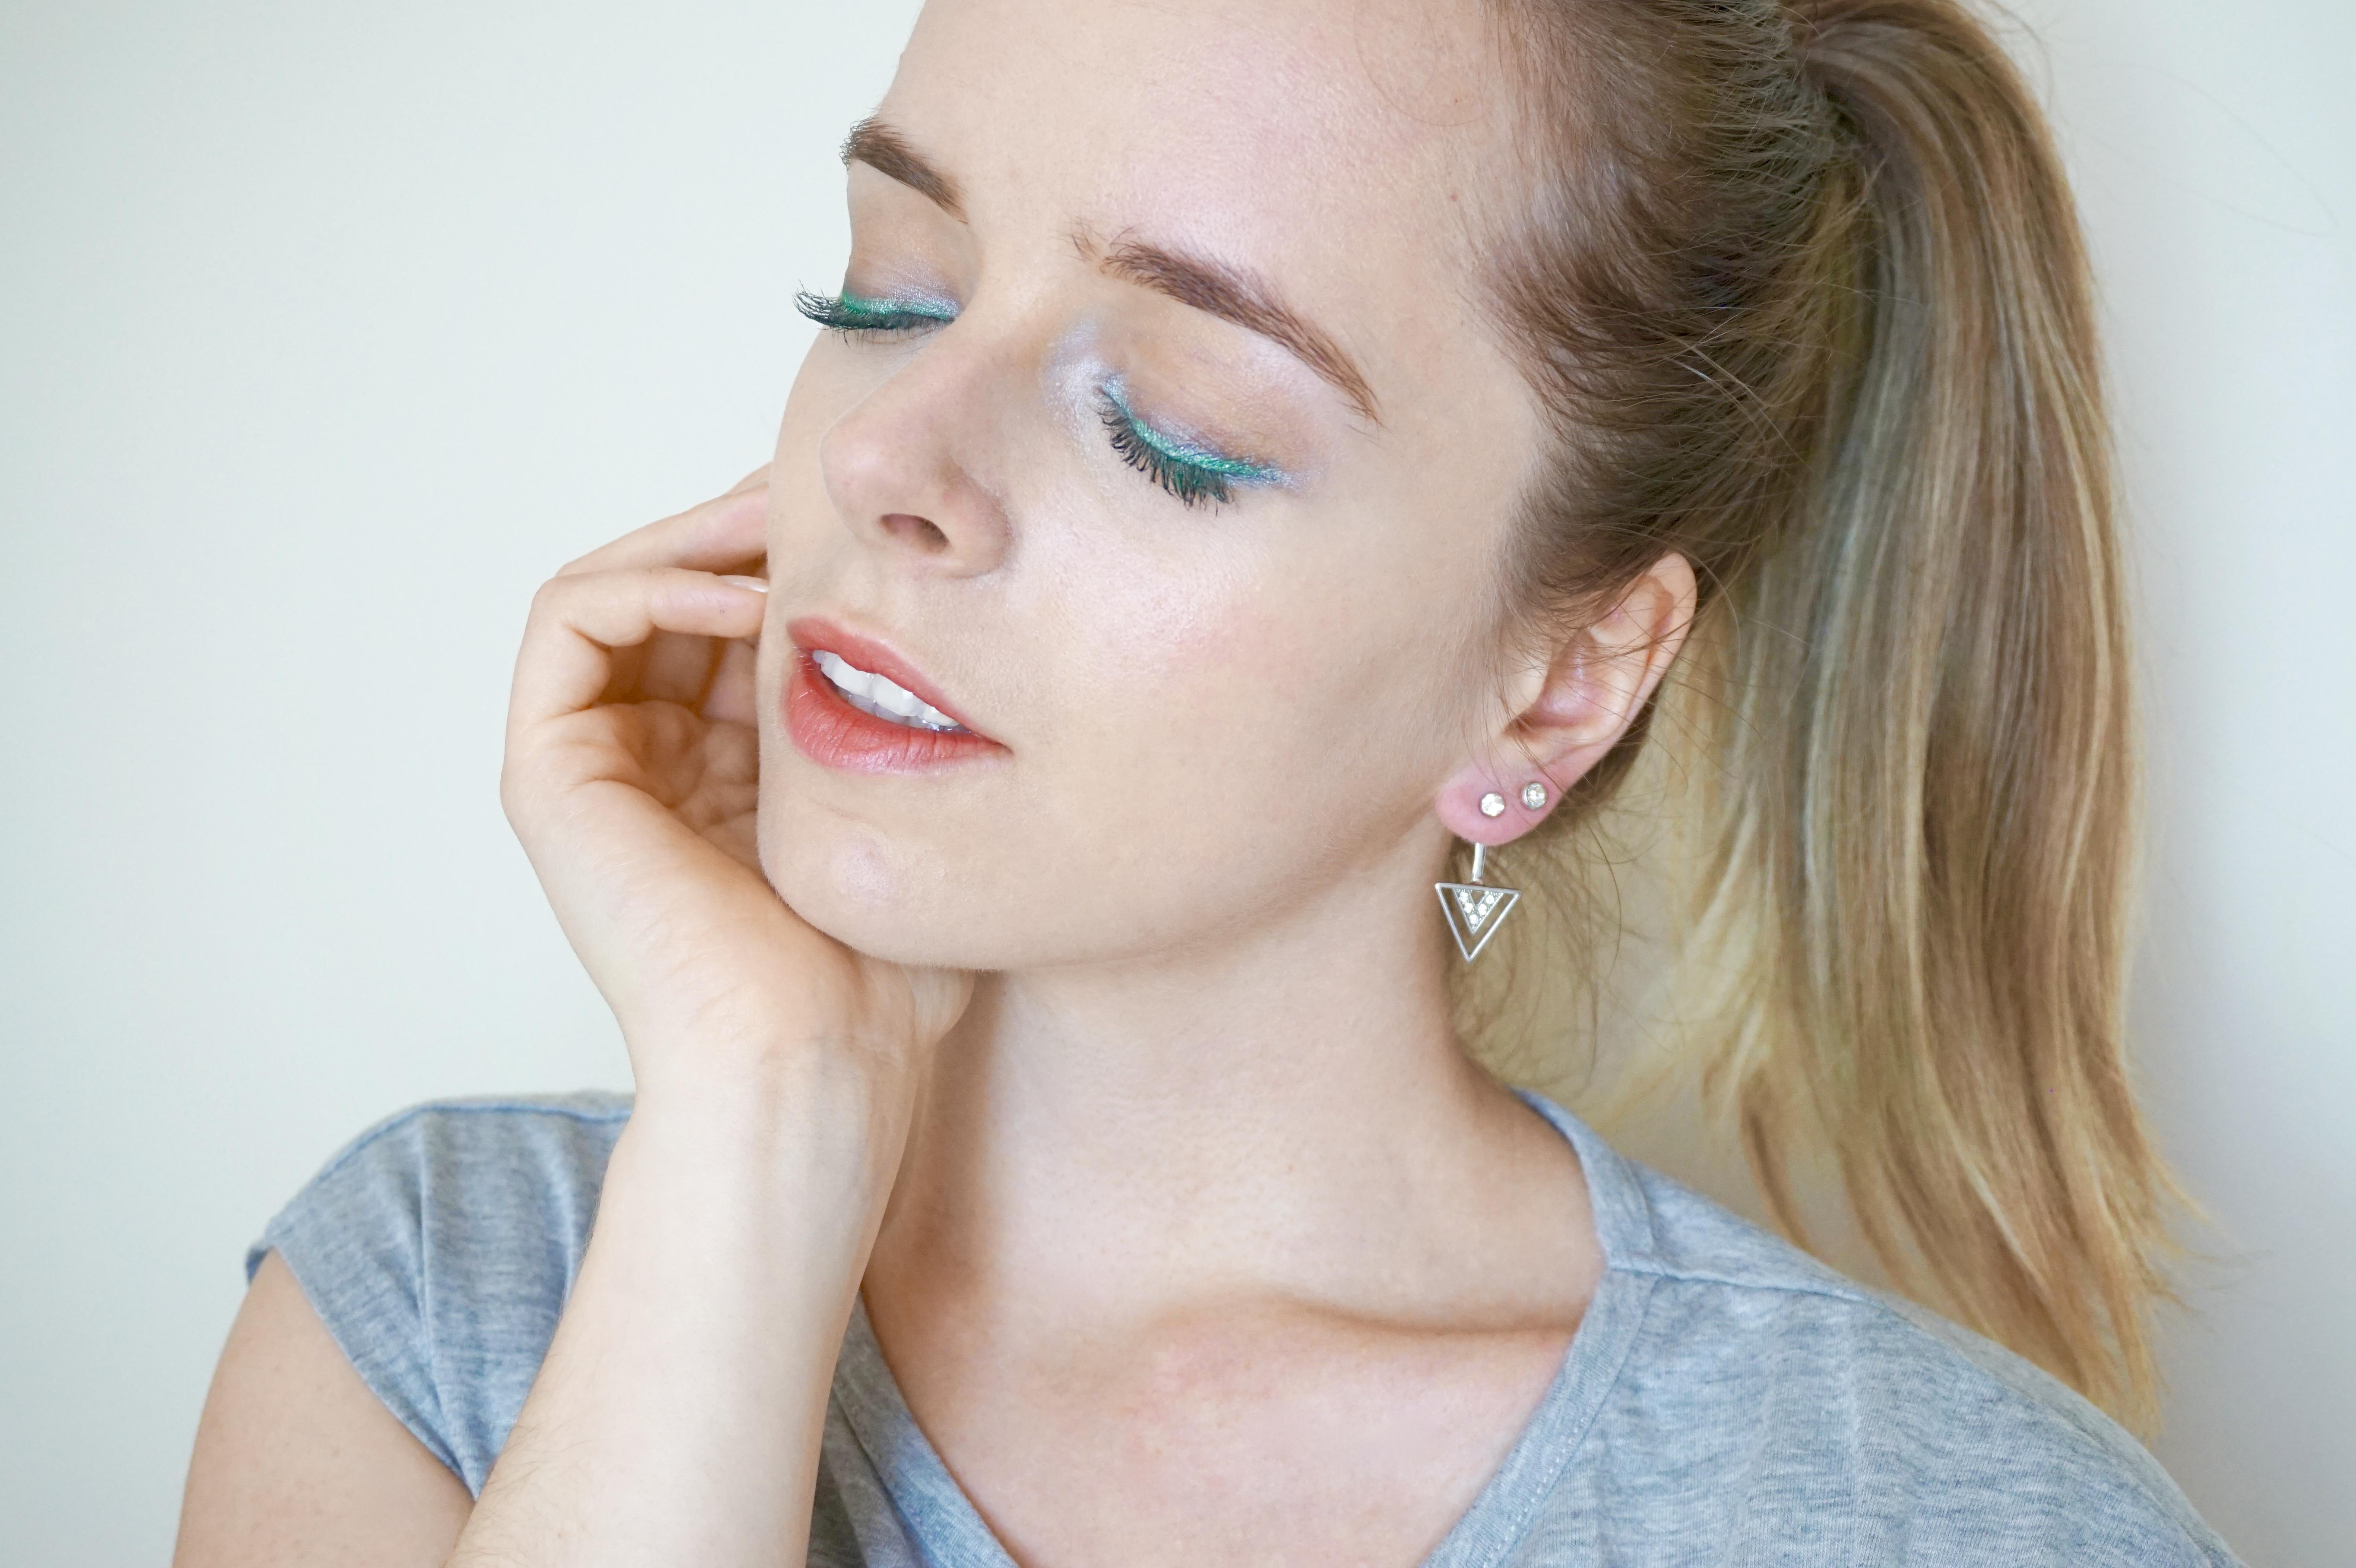 Maquillage vert argenté